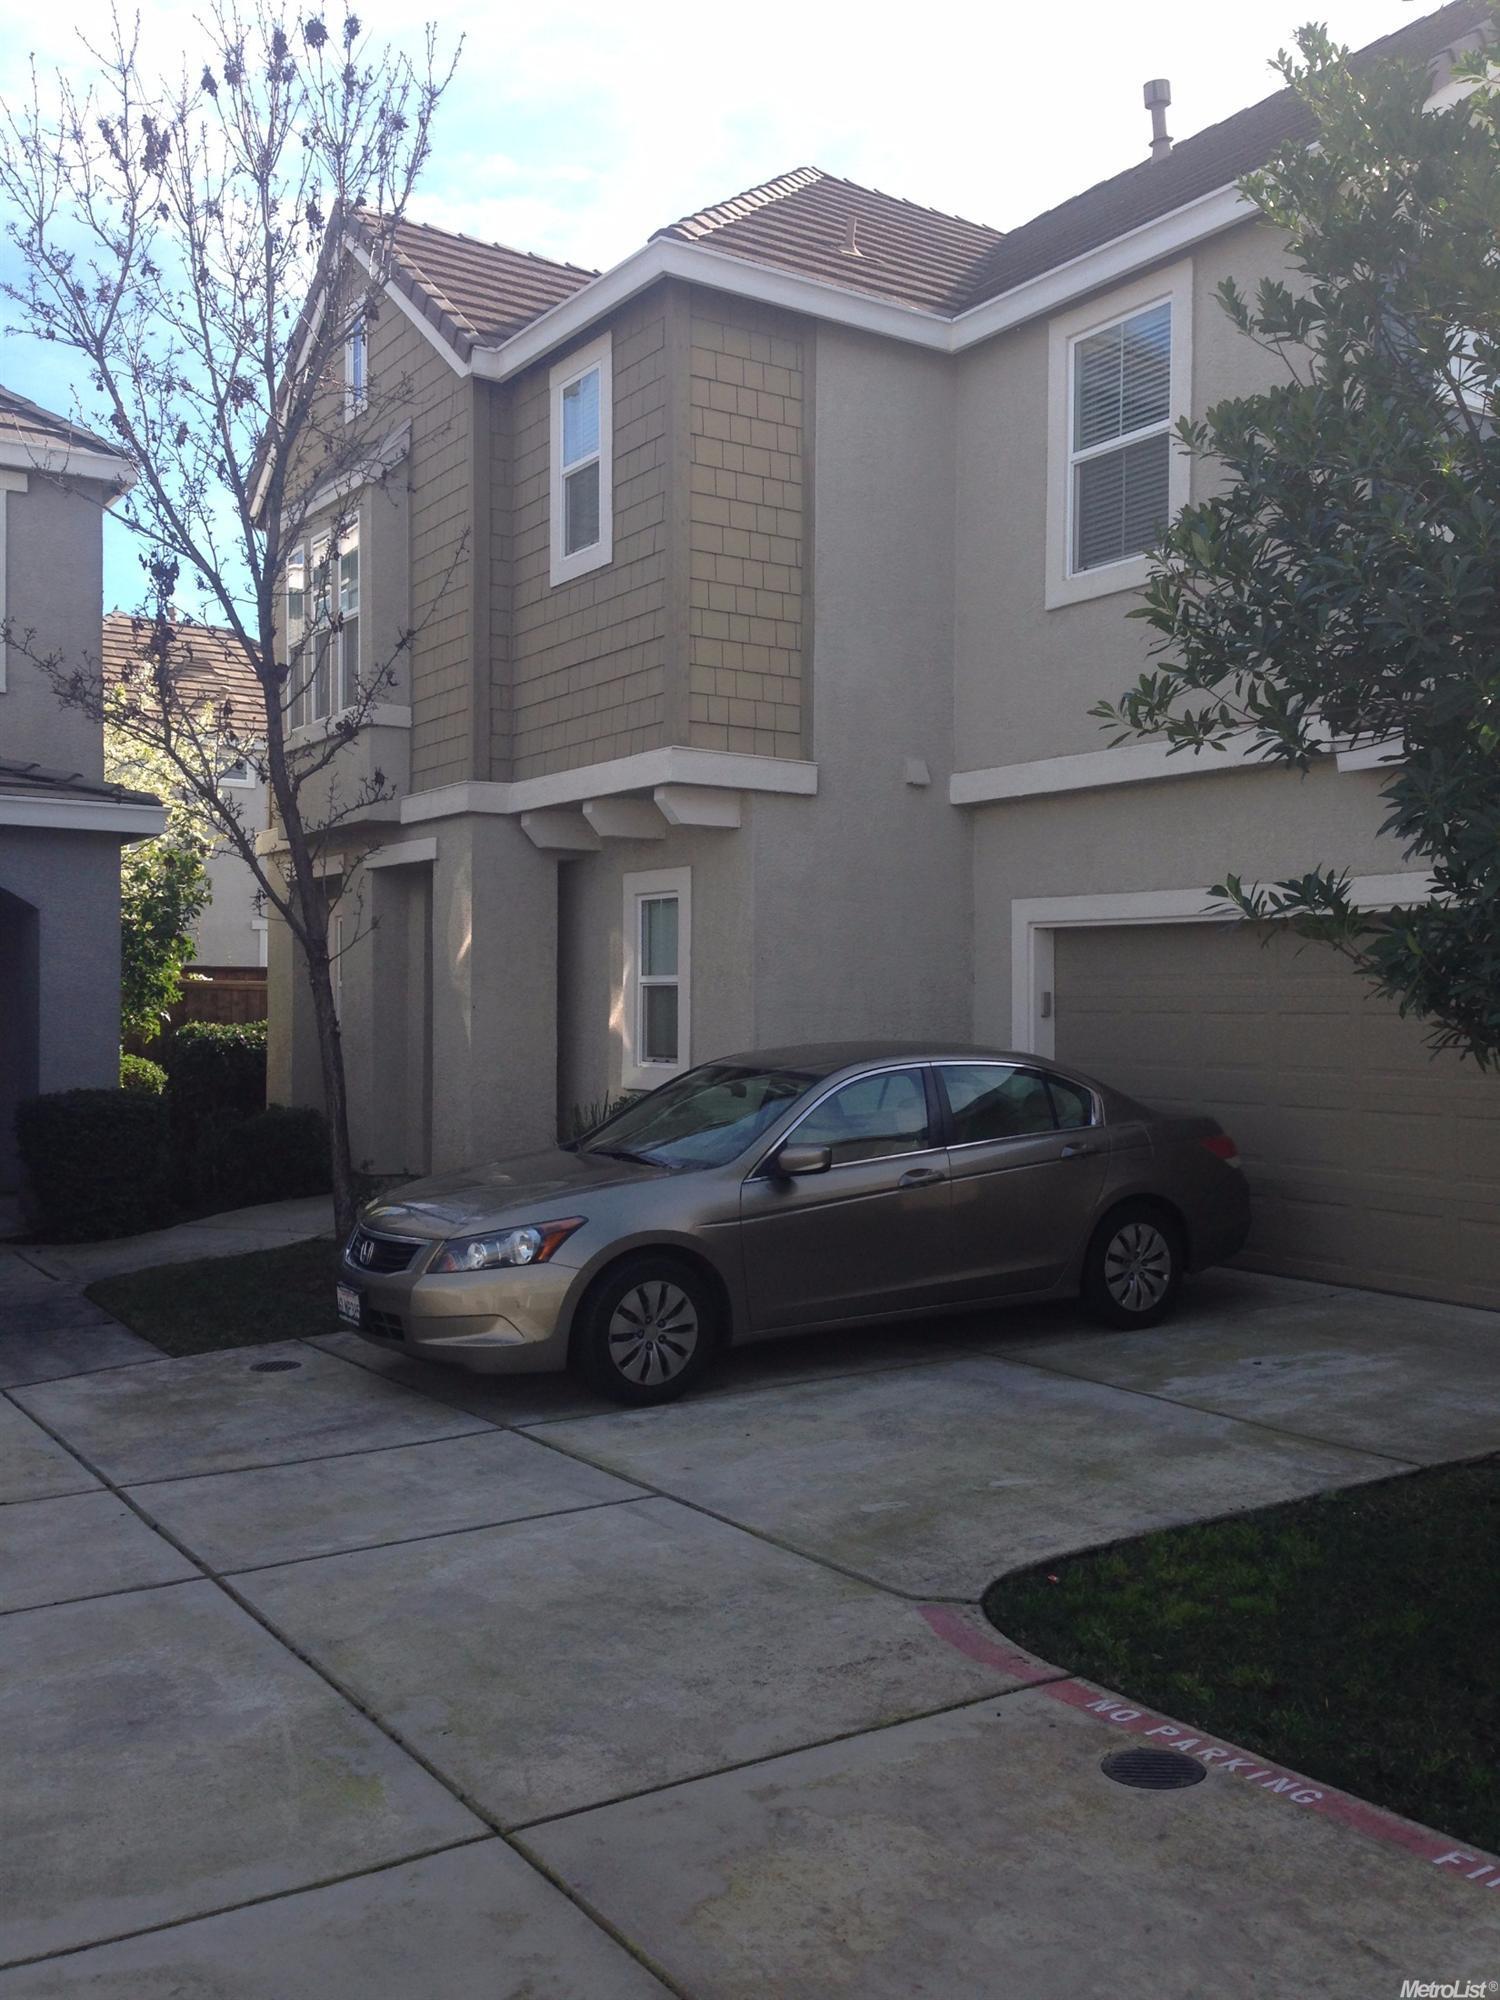 172 Phoenix Cir, Lincoln, CA